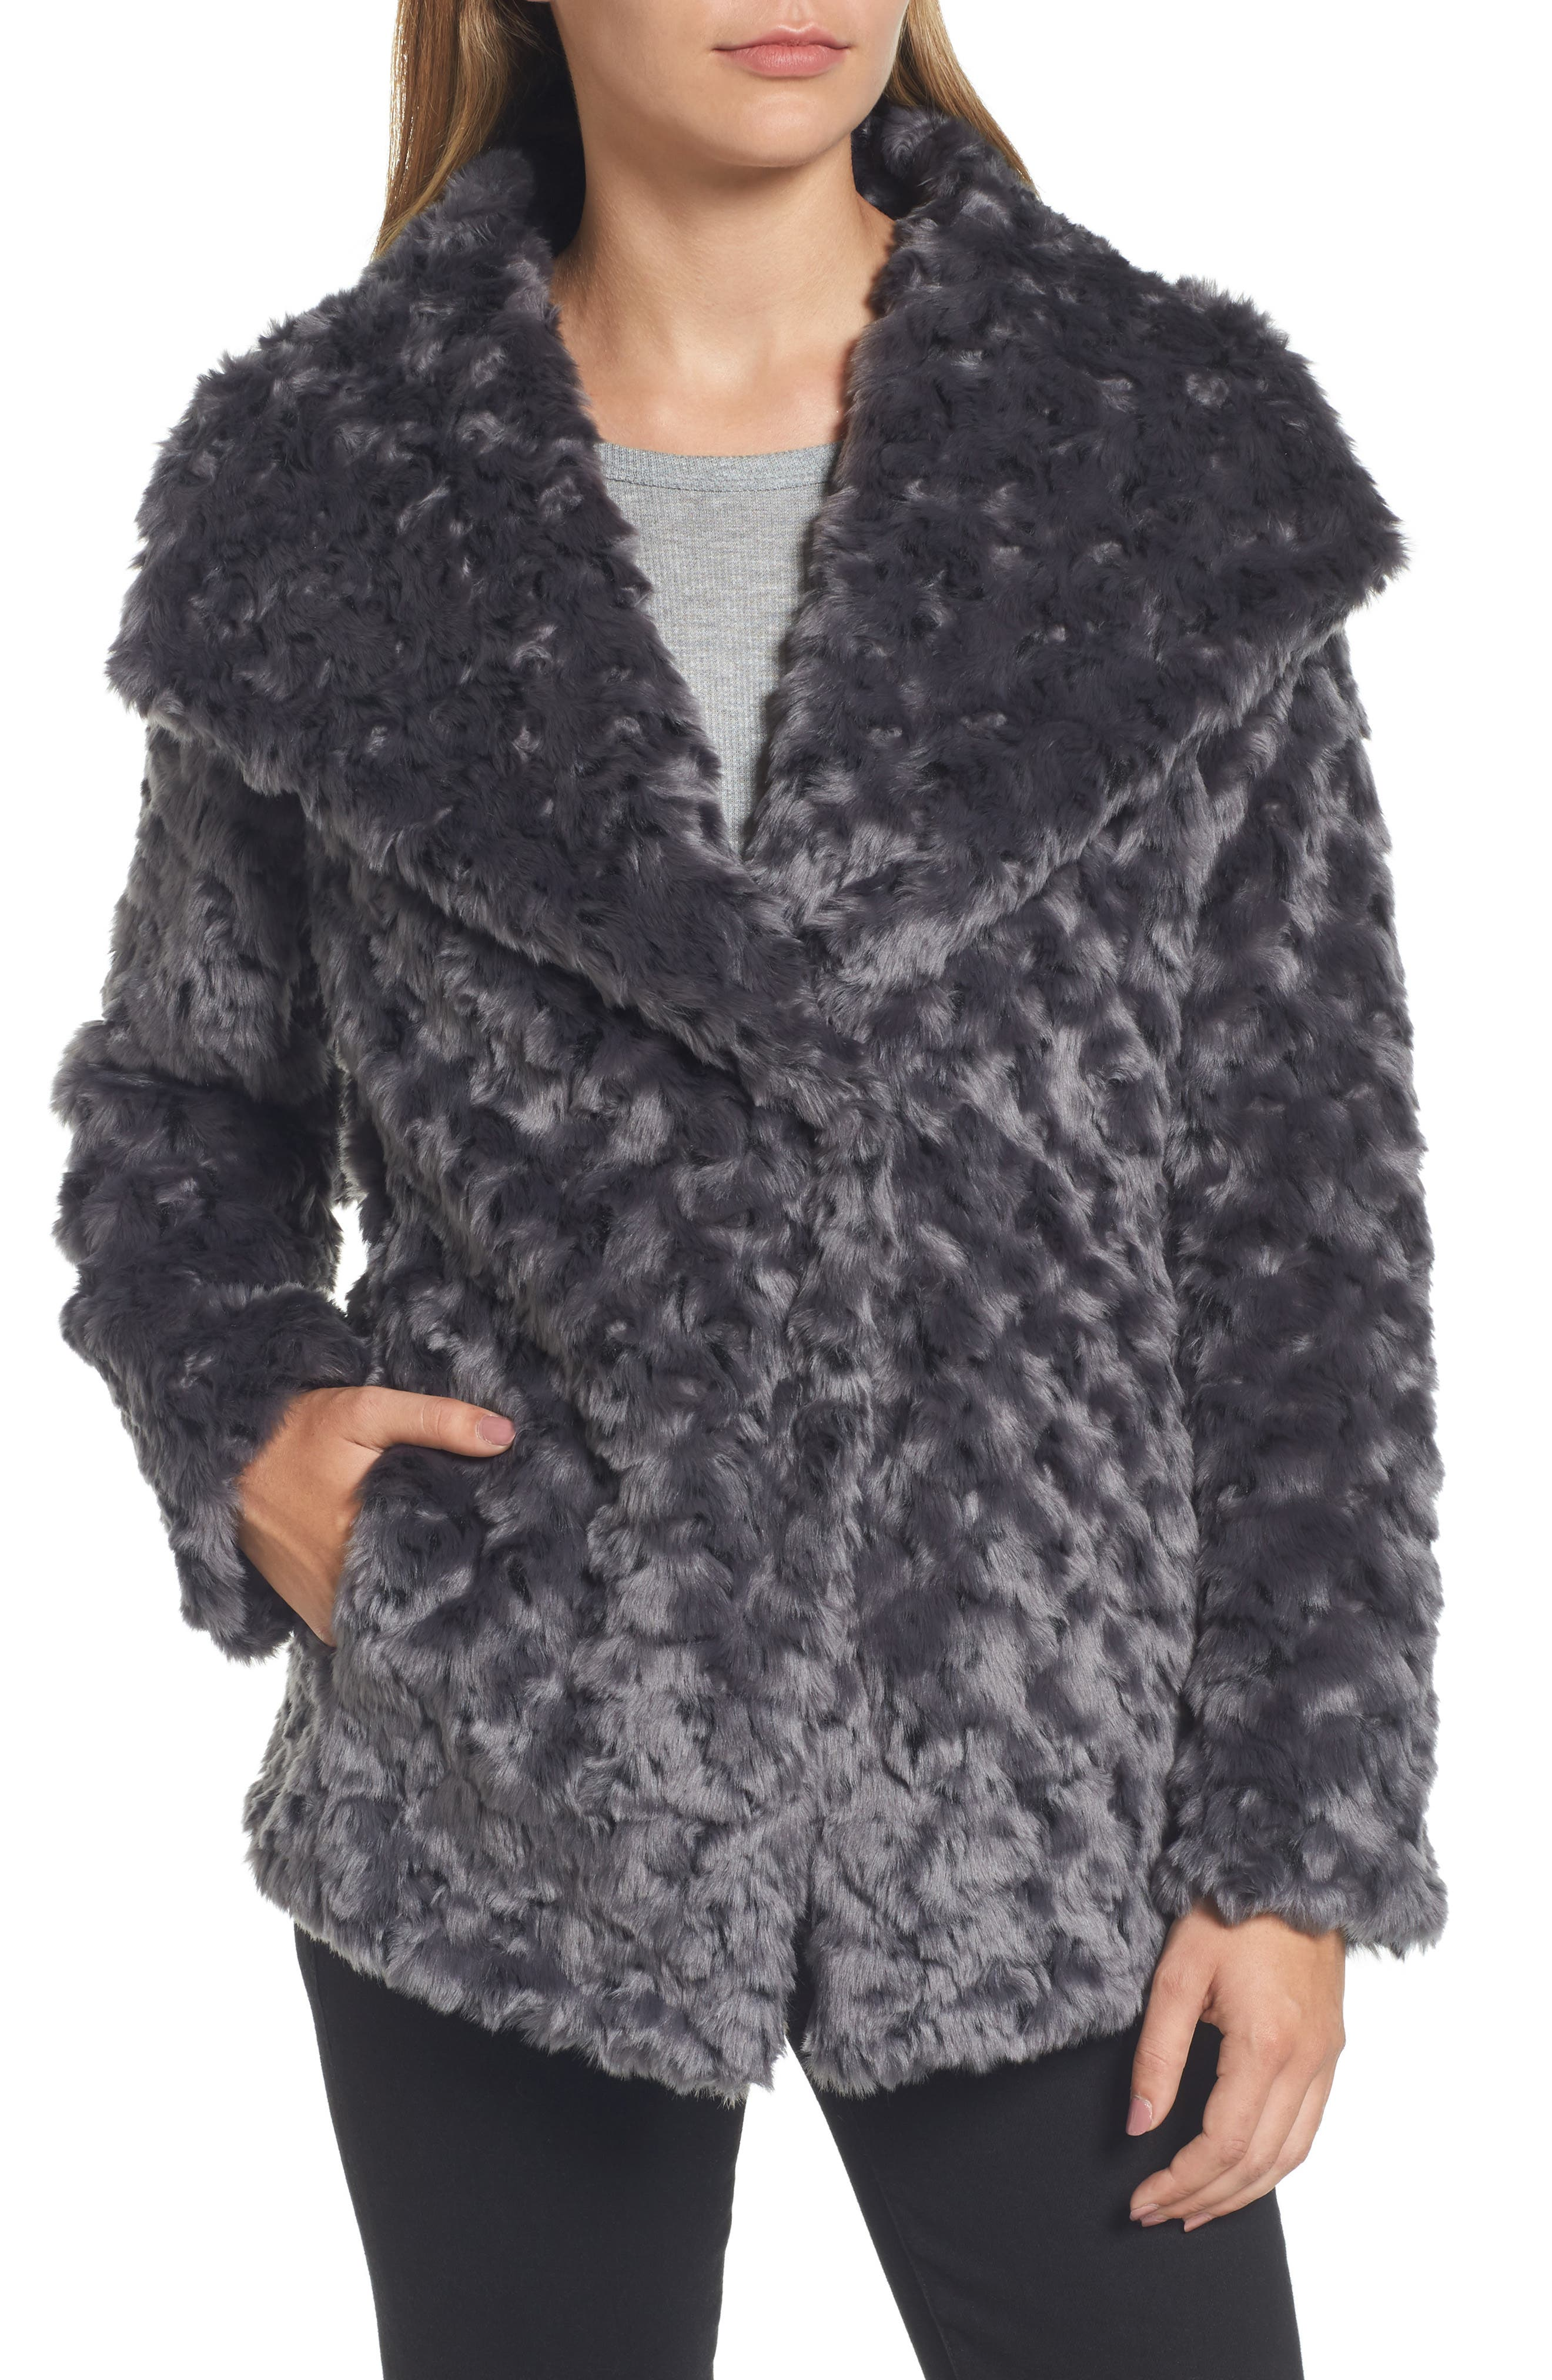 Roslyn Faux Fur Jacket,                             Alternate thumbnail 4, color,                             French Grey